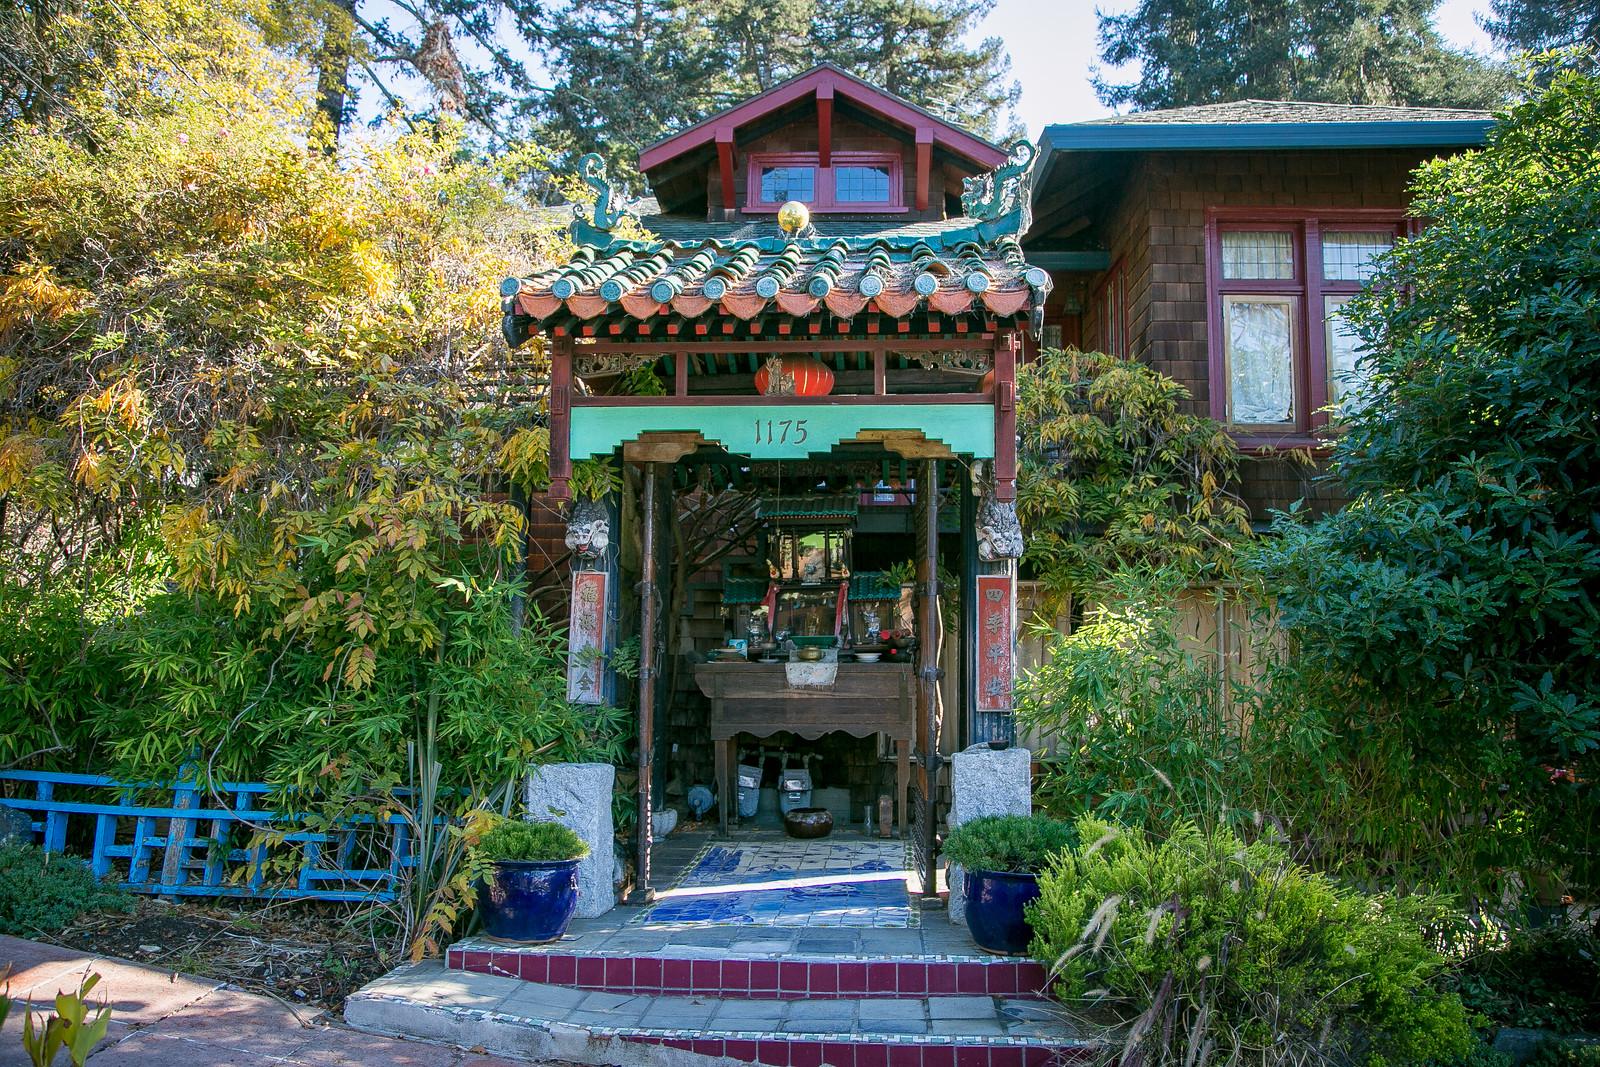 Quirky Berkeley in Berkeley, Calif. on Wednesday, November 11th, 2015.